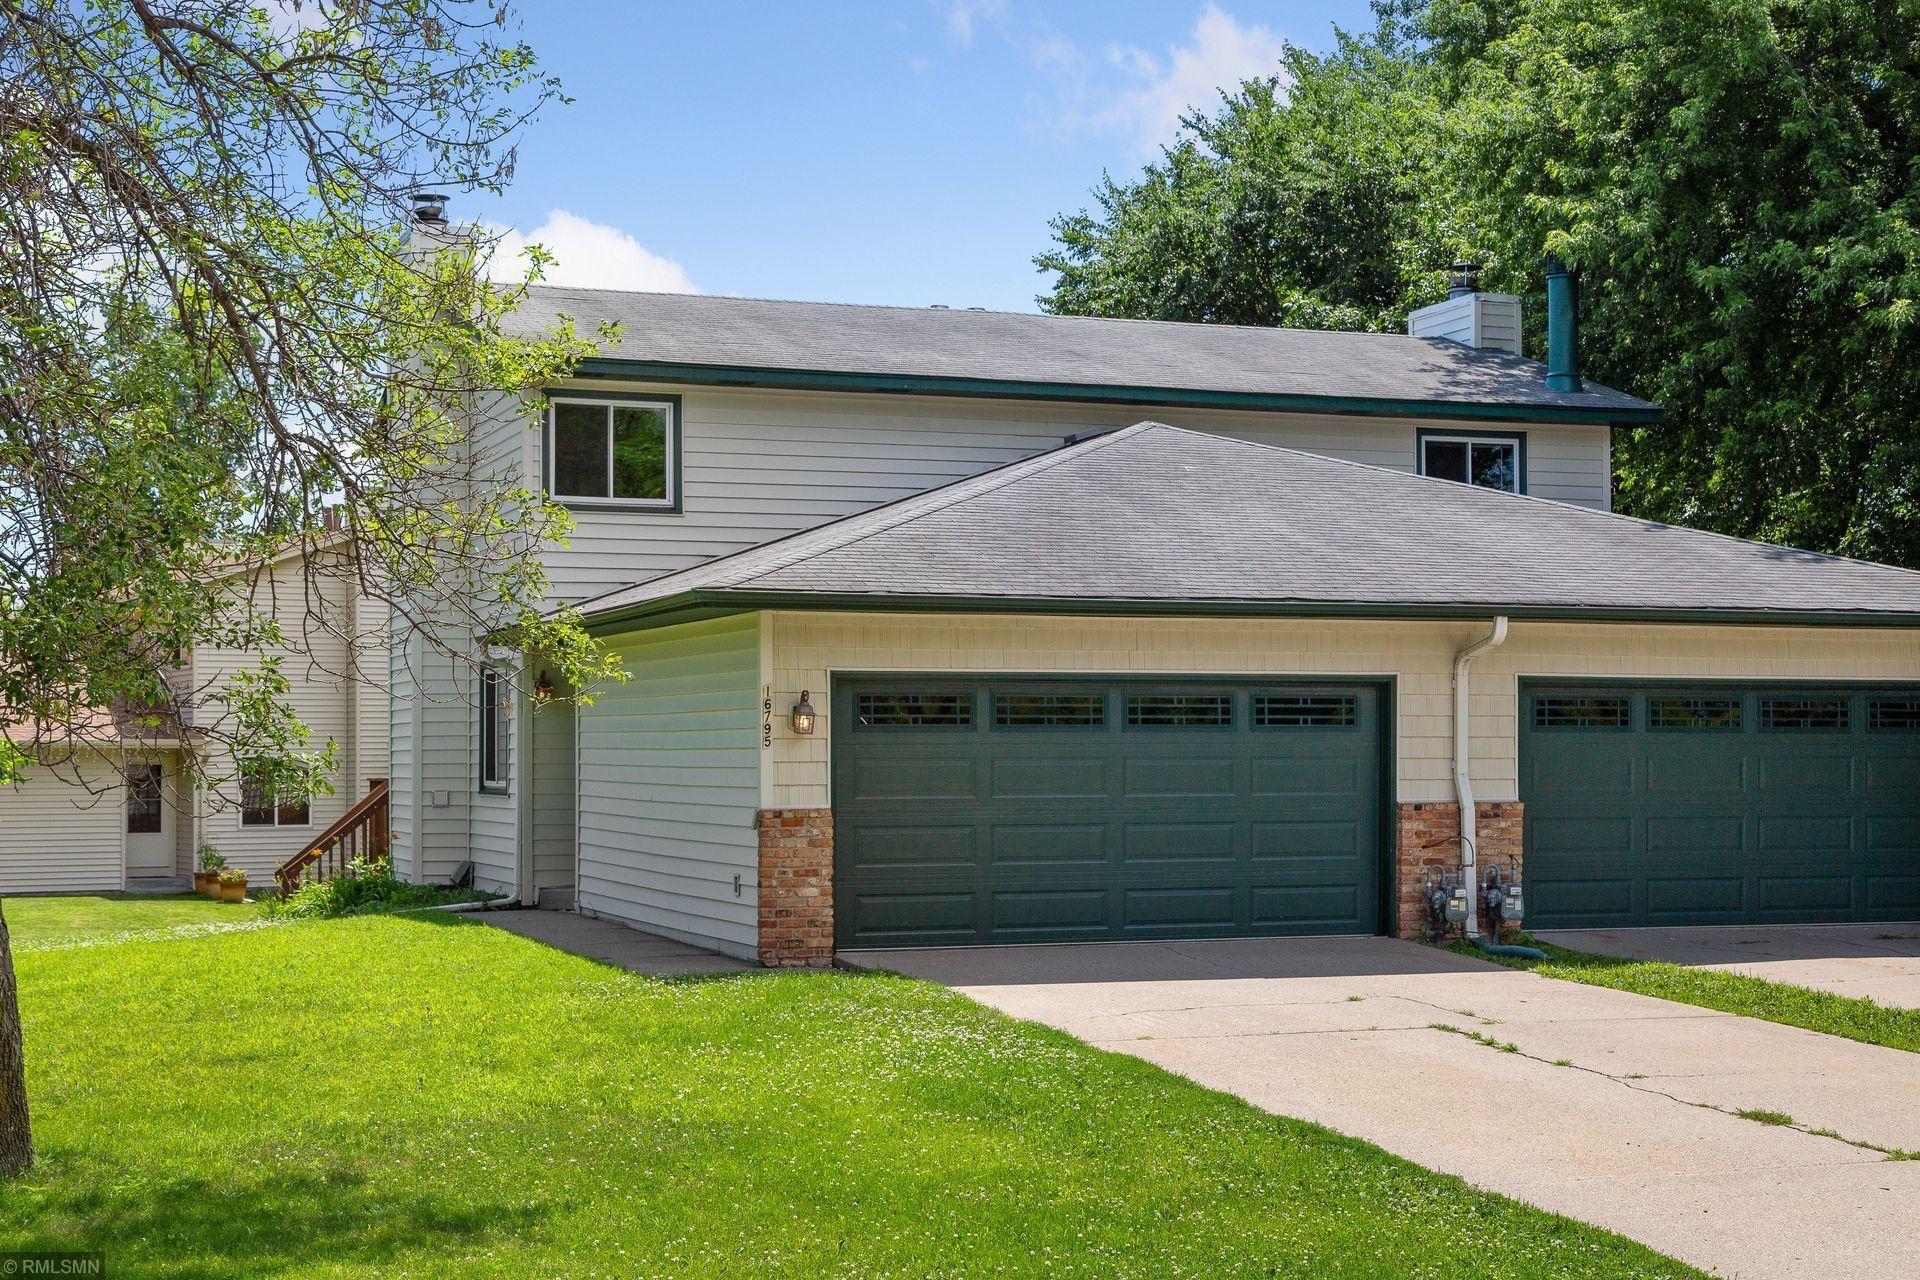 16795 Terrey Pine Drive, Eden Prairie, MN 55347 - MLS#: 5618563